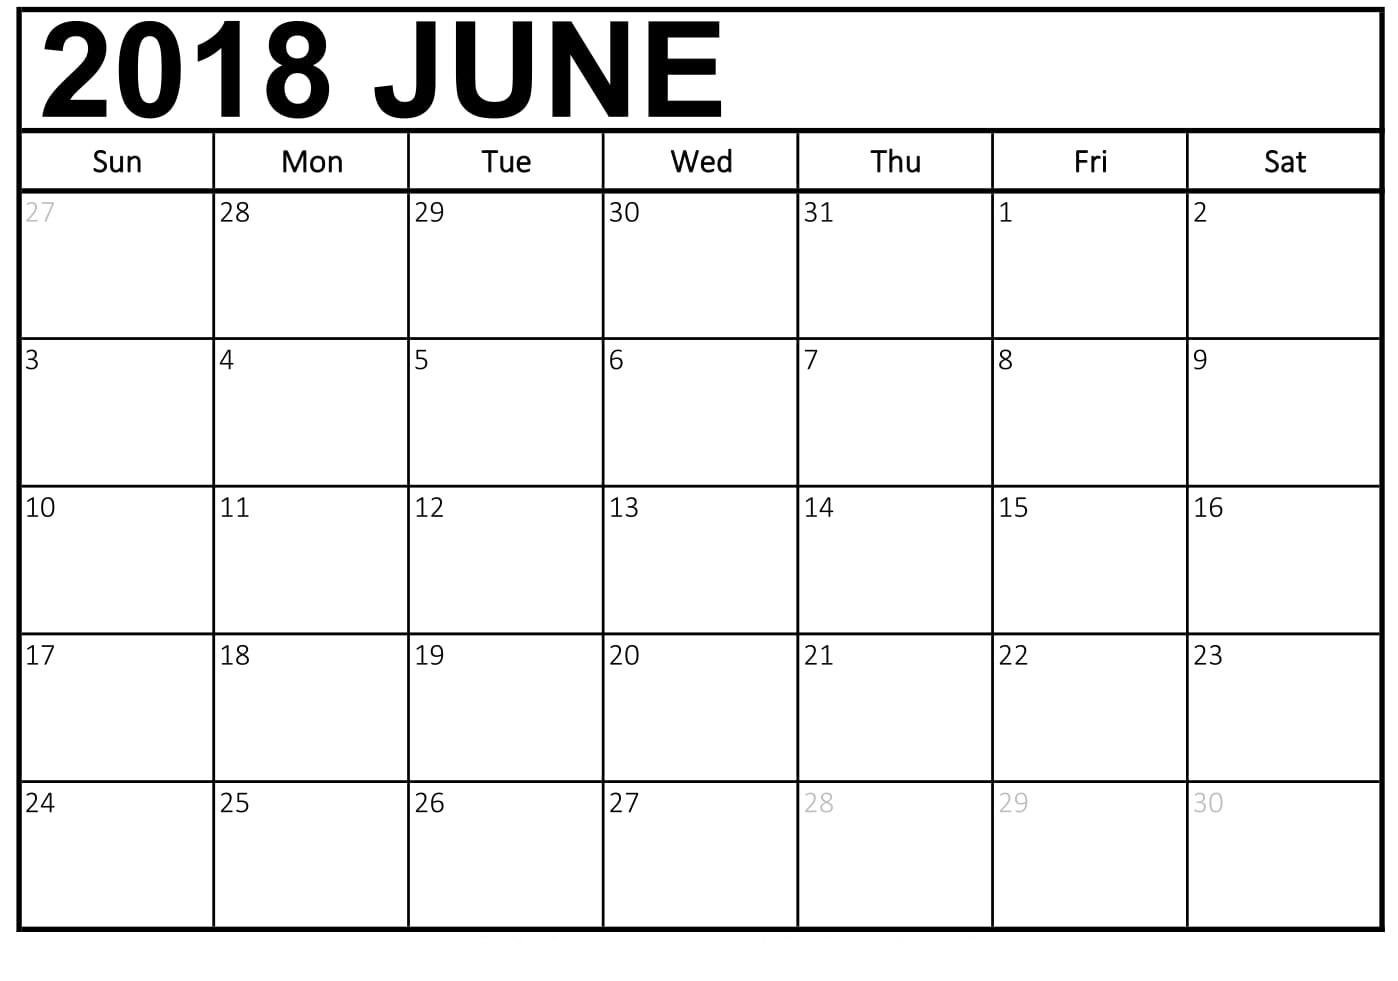 Download June 2018 Calendar